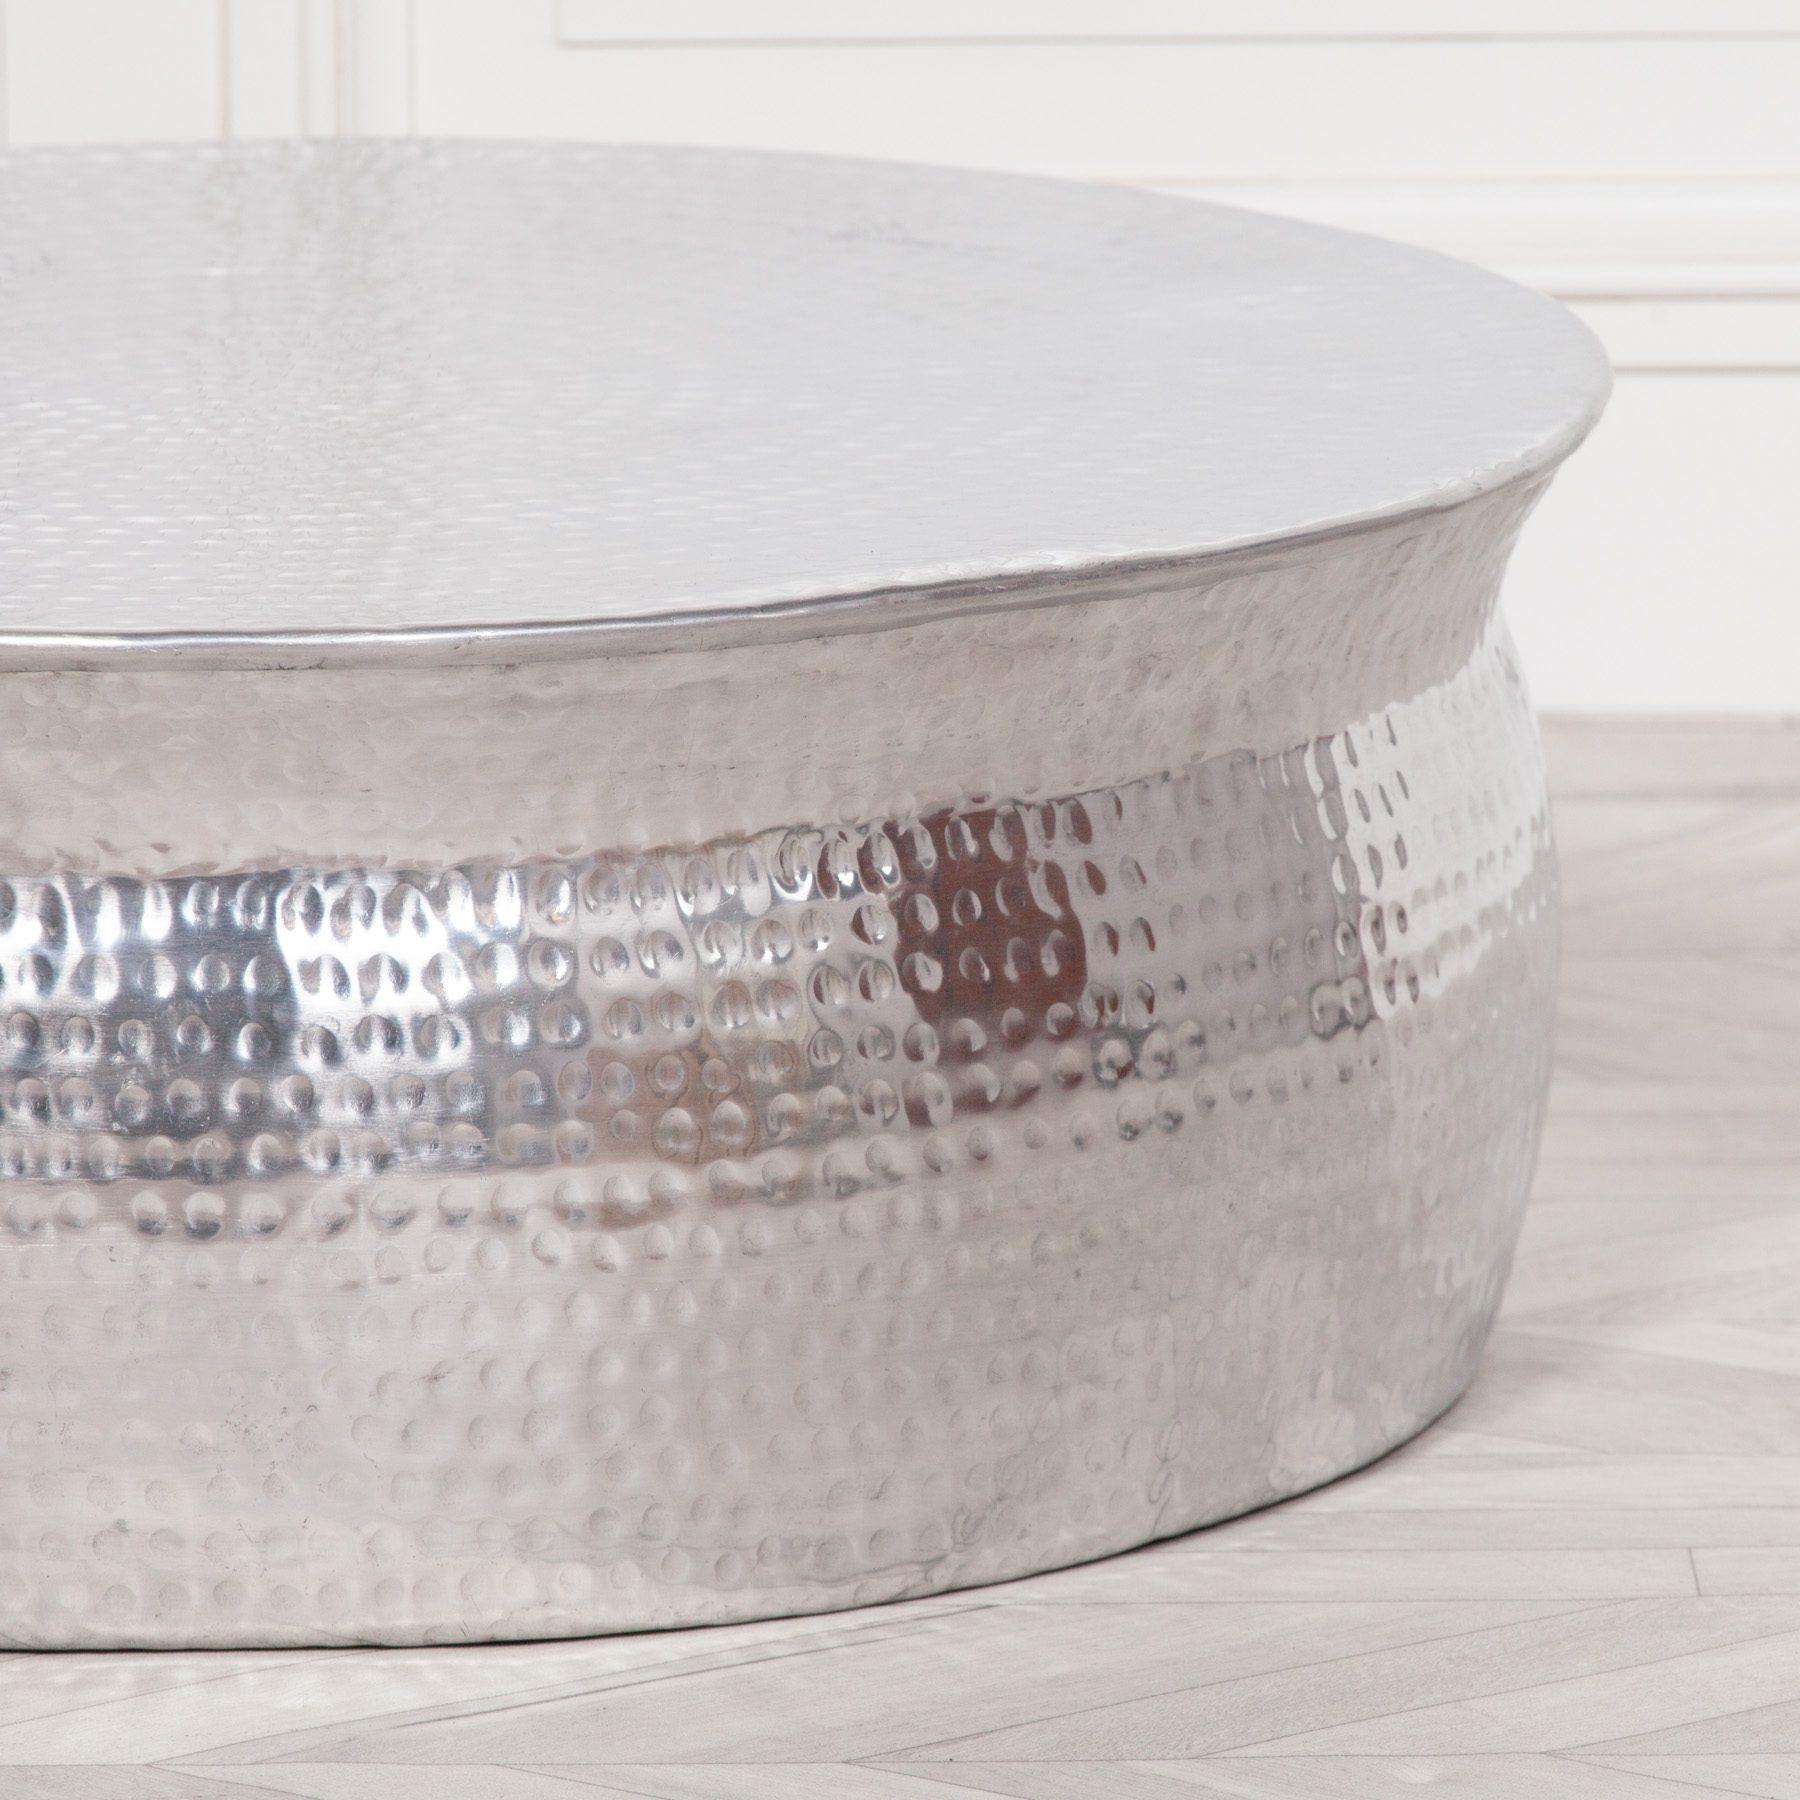 Aluminium Round Coffee Table (Copy)